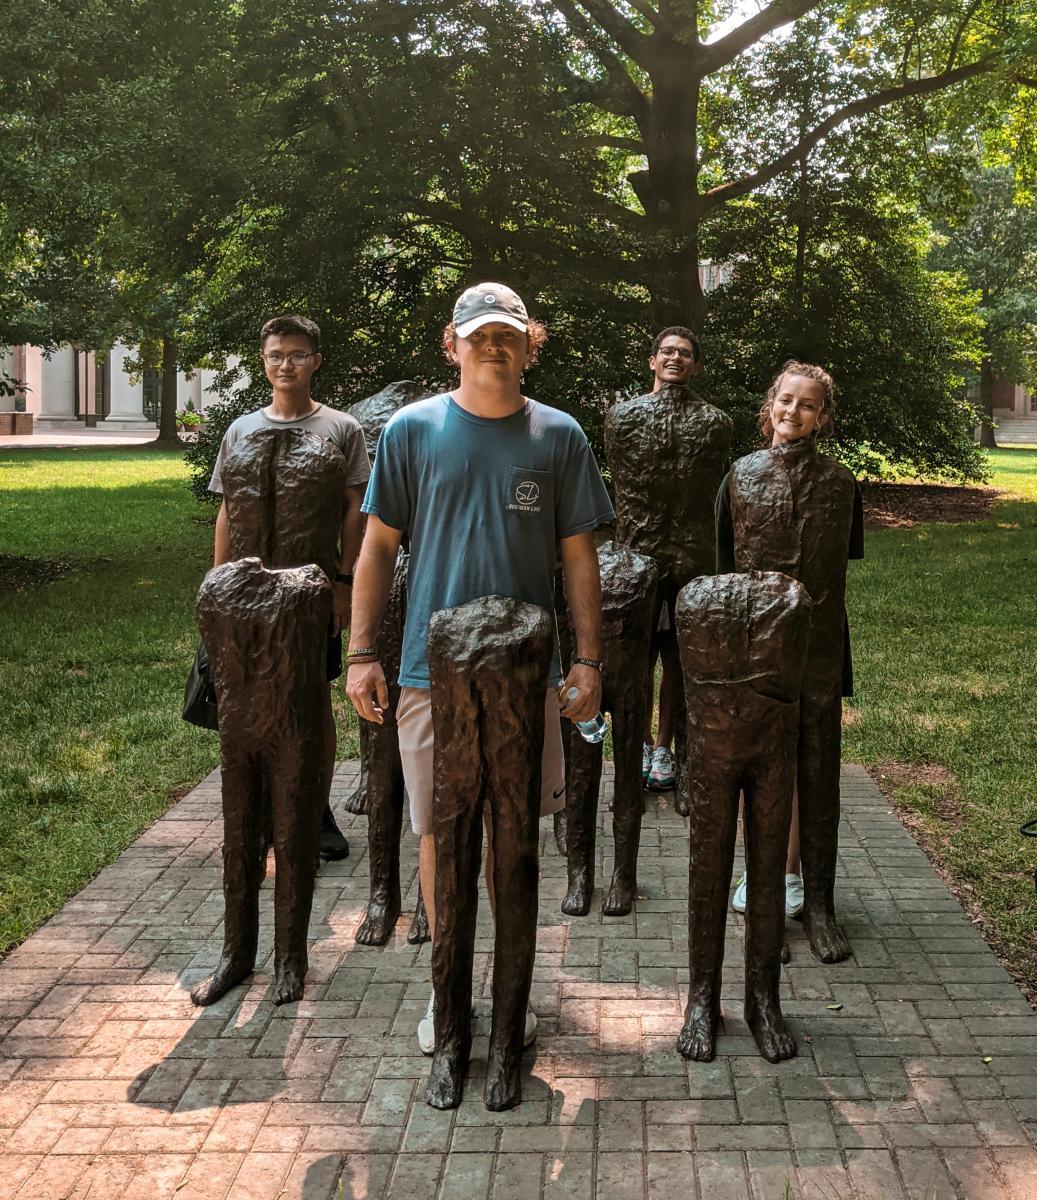 Davidson College sculpture Group of Ten